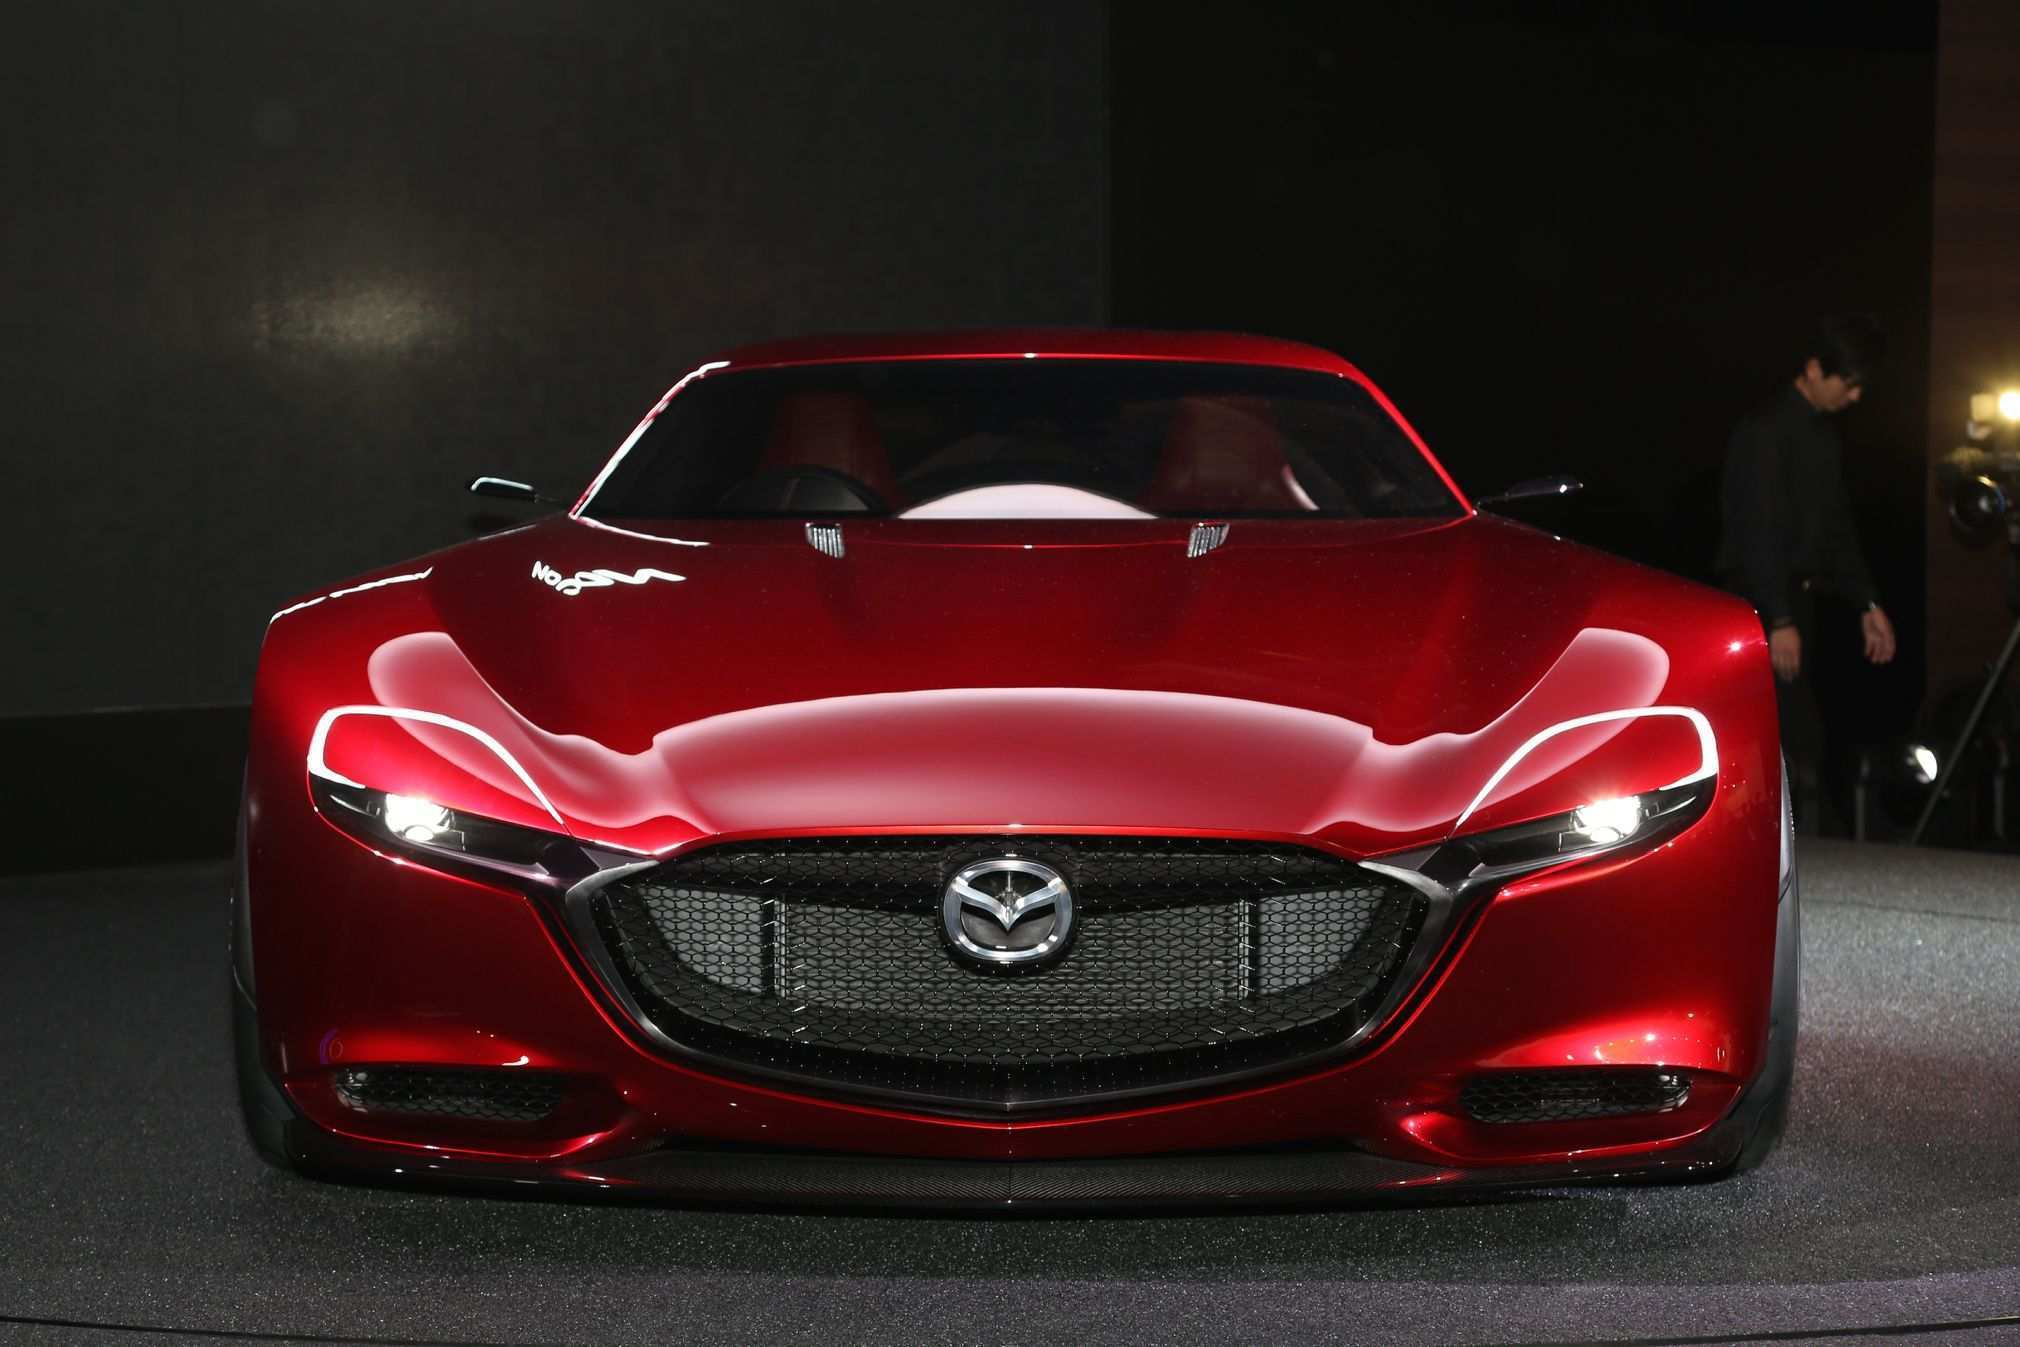 60 Great Mazda Vision 2020 Pictures for Mazda Vision 2020